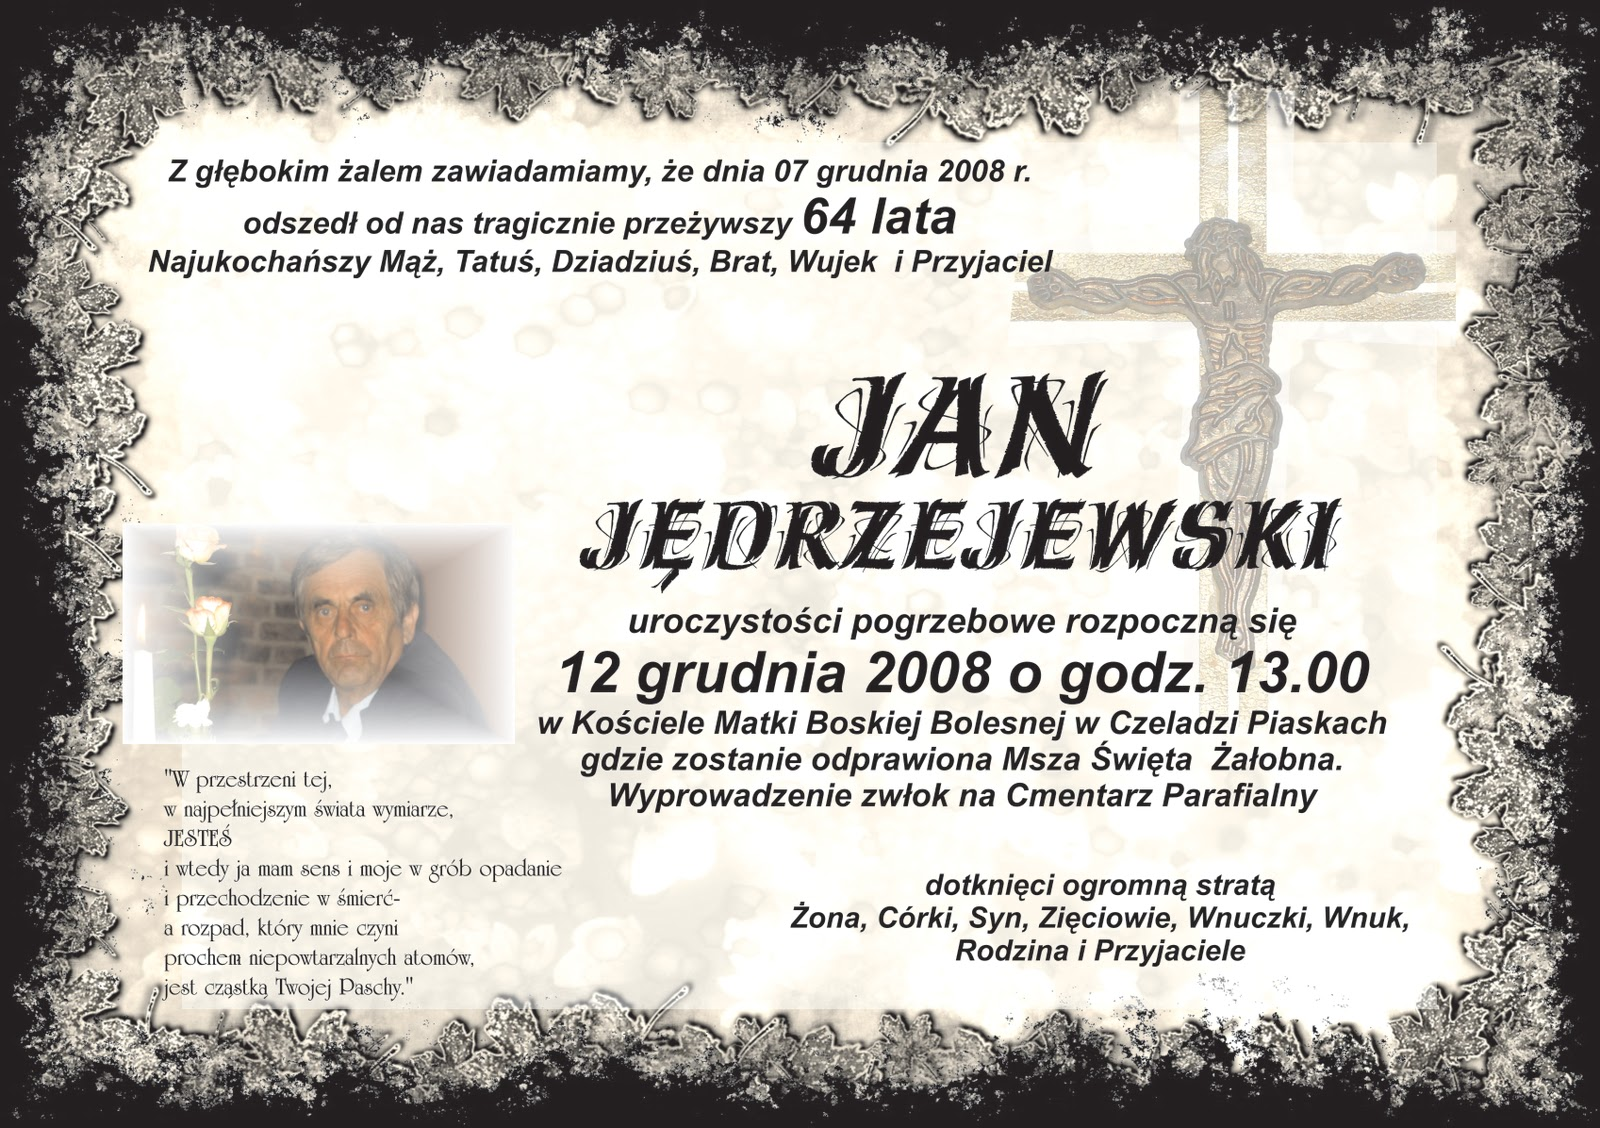 Dizajn Erka Listopada 2010